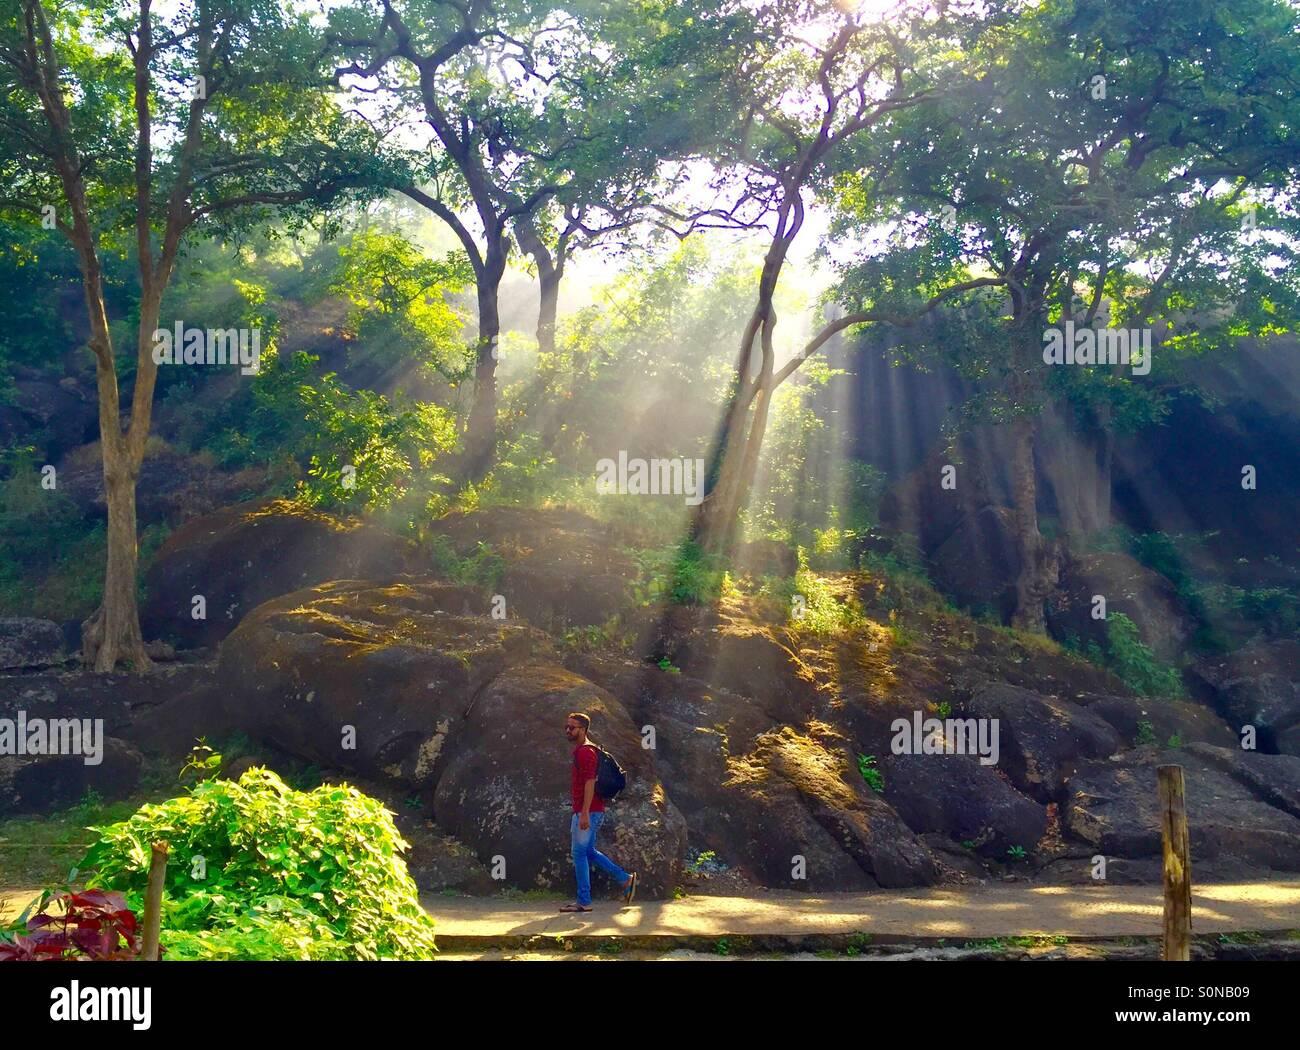 Winter mornings in sanjay gandhi national park. - Stock Image